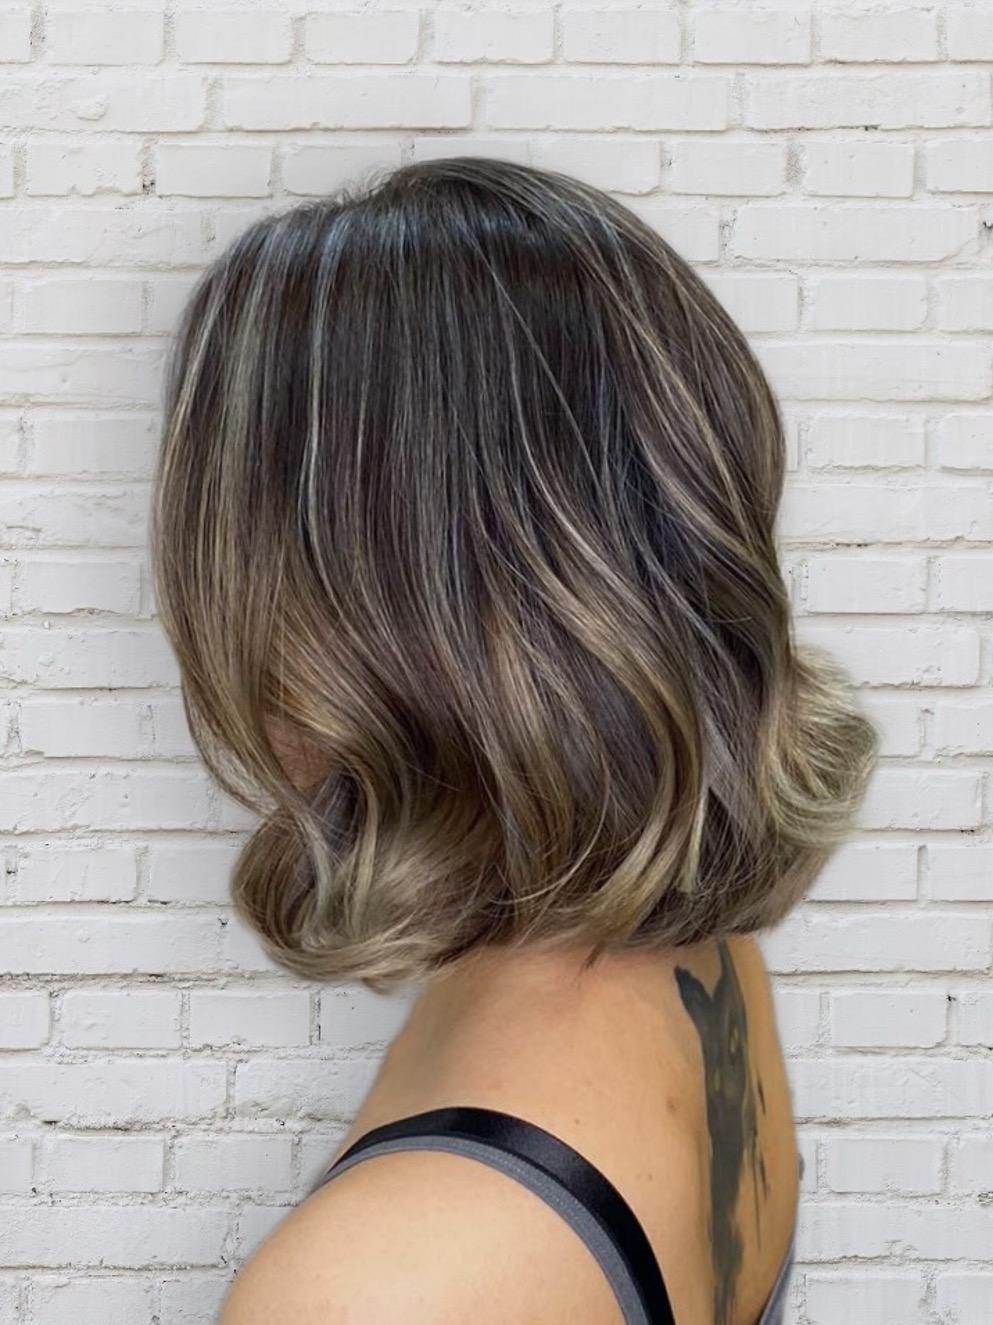 Brown Hair Colour Trend 2022: Ash Bronde Highlights